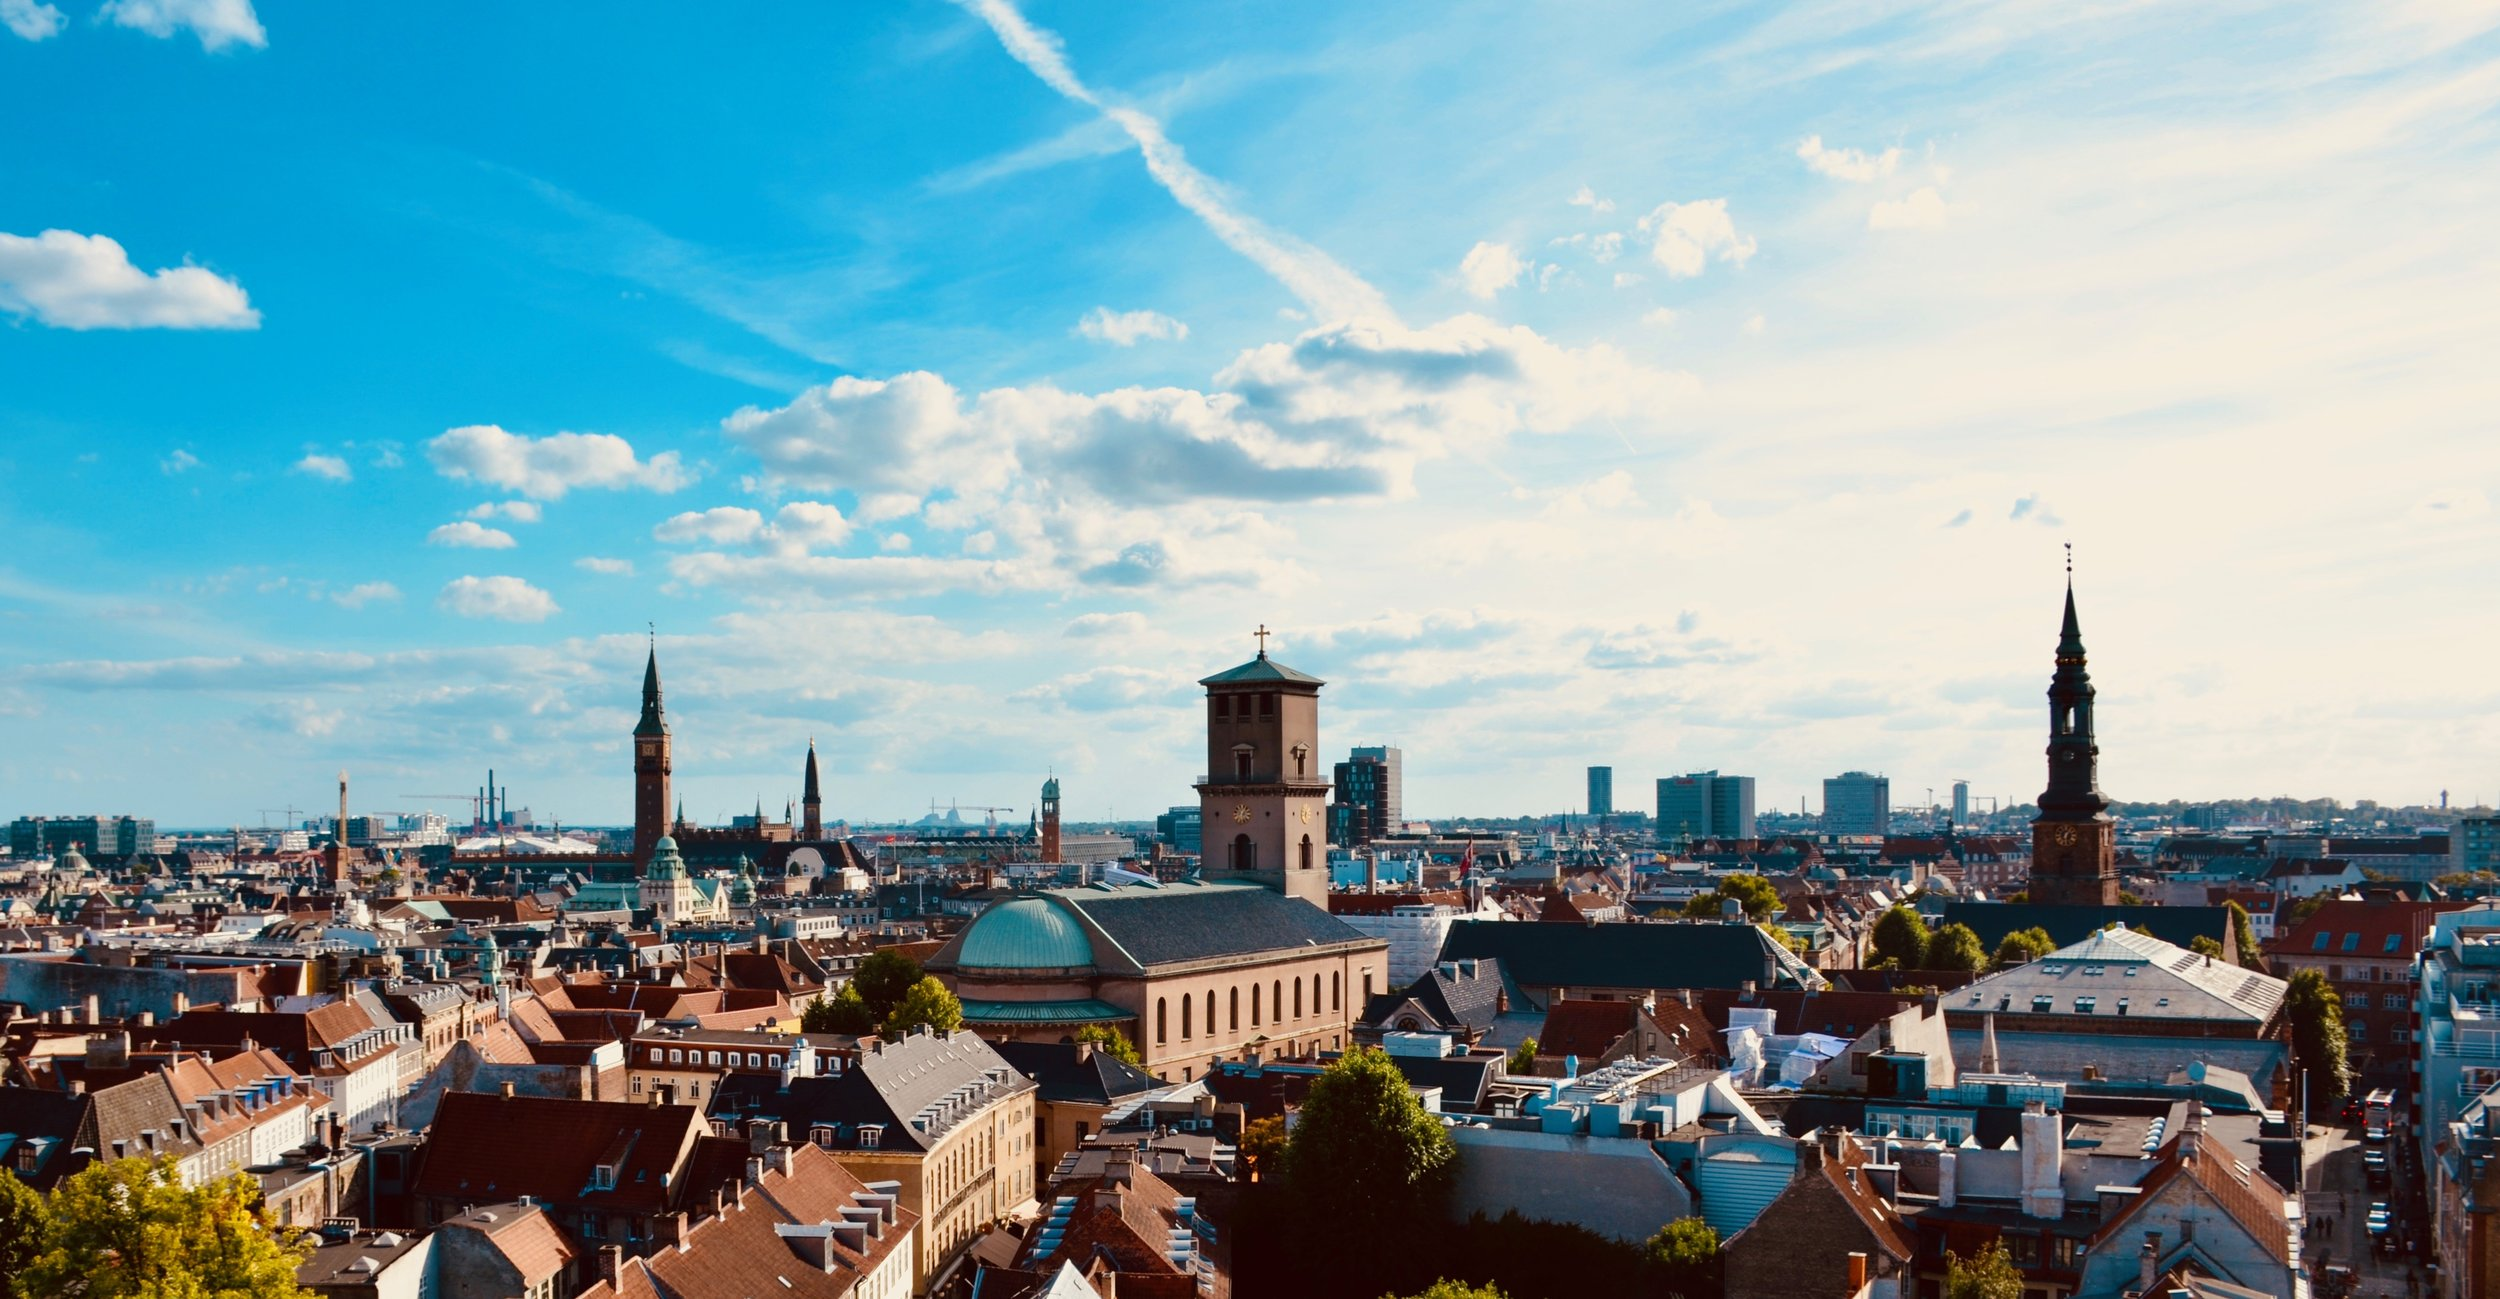 A view over Copenhagen from the tower of Trinitatis Kirke, Copenhagen.